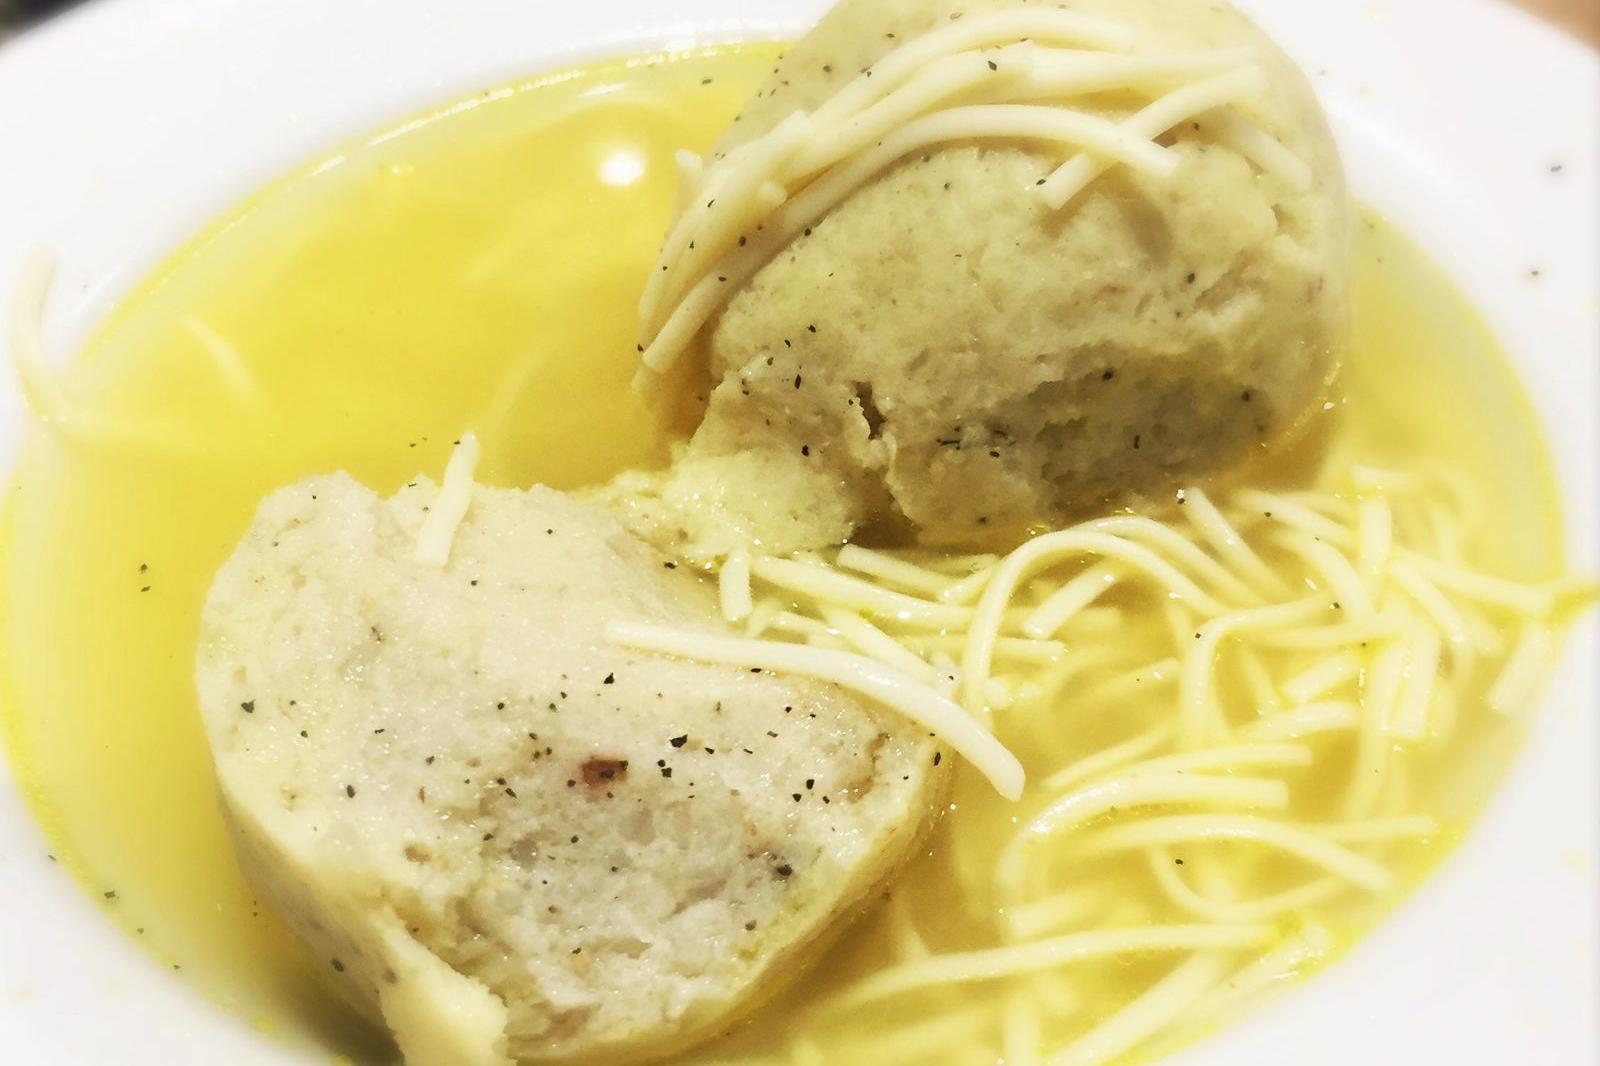 Matzo ball soup from Ben & Irv's in Huntingdon Valley. (CRAIG LABAN / Staff)